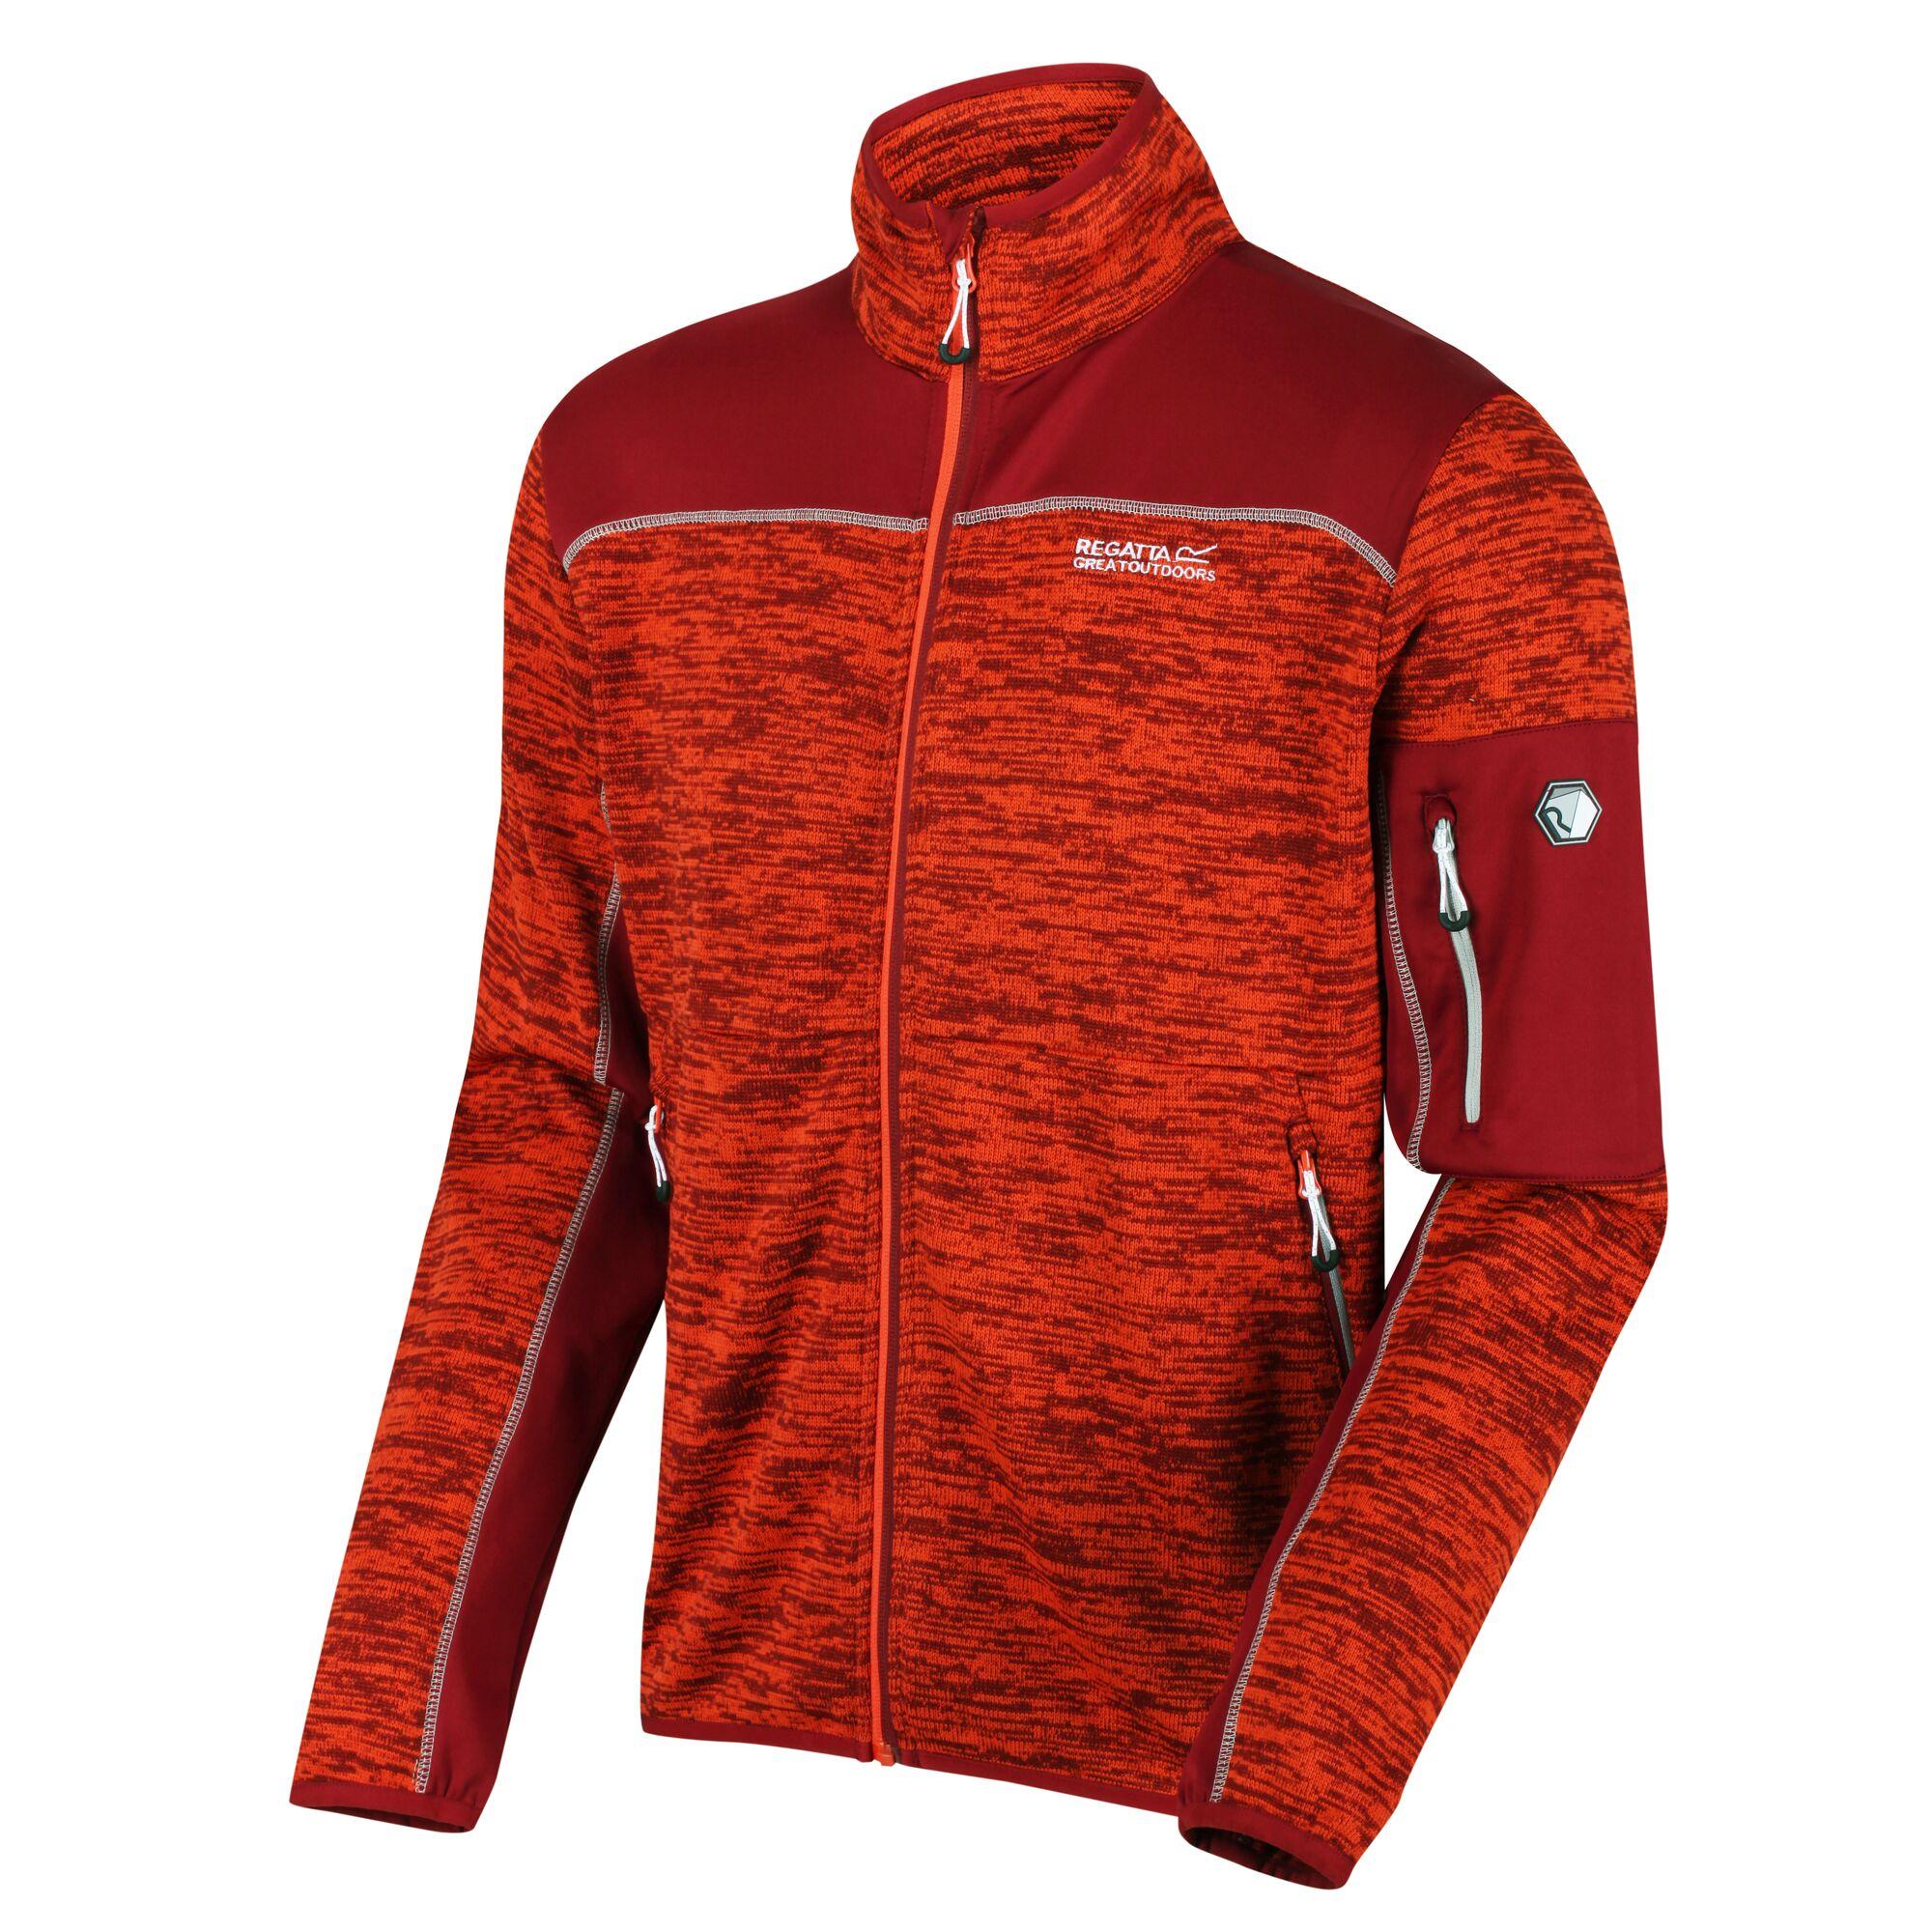 Regatta Men/'s Collumbus VI Heavyweight Full Zip Stretch Fleece Orange